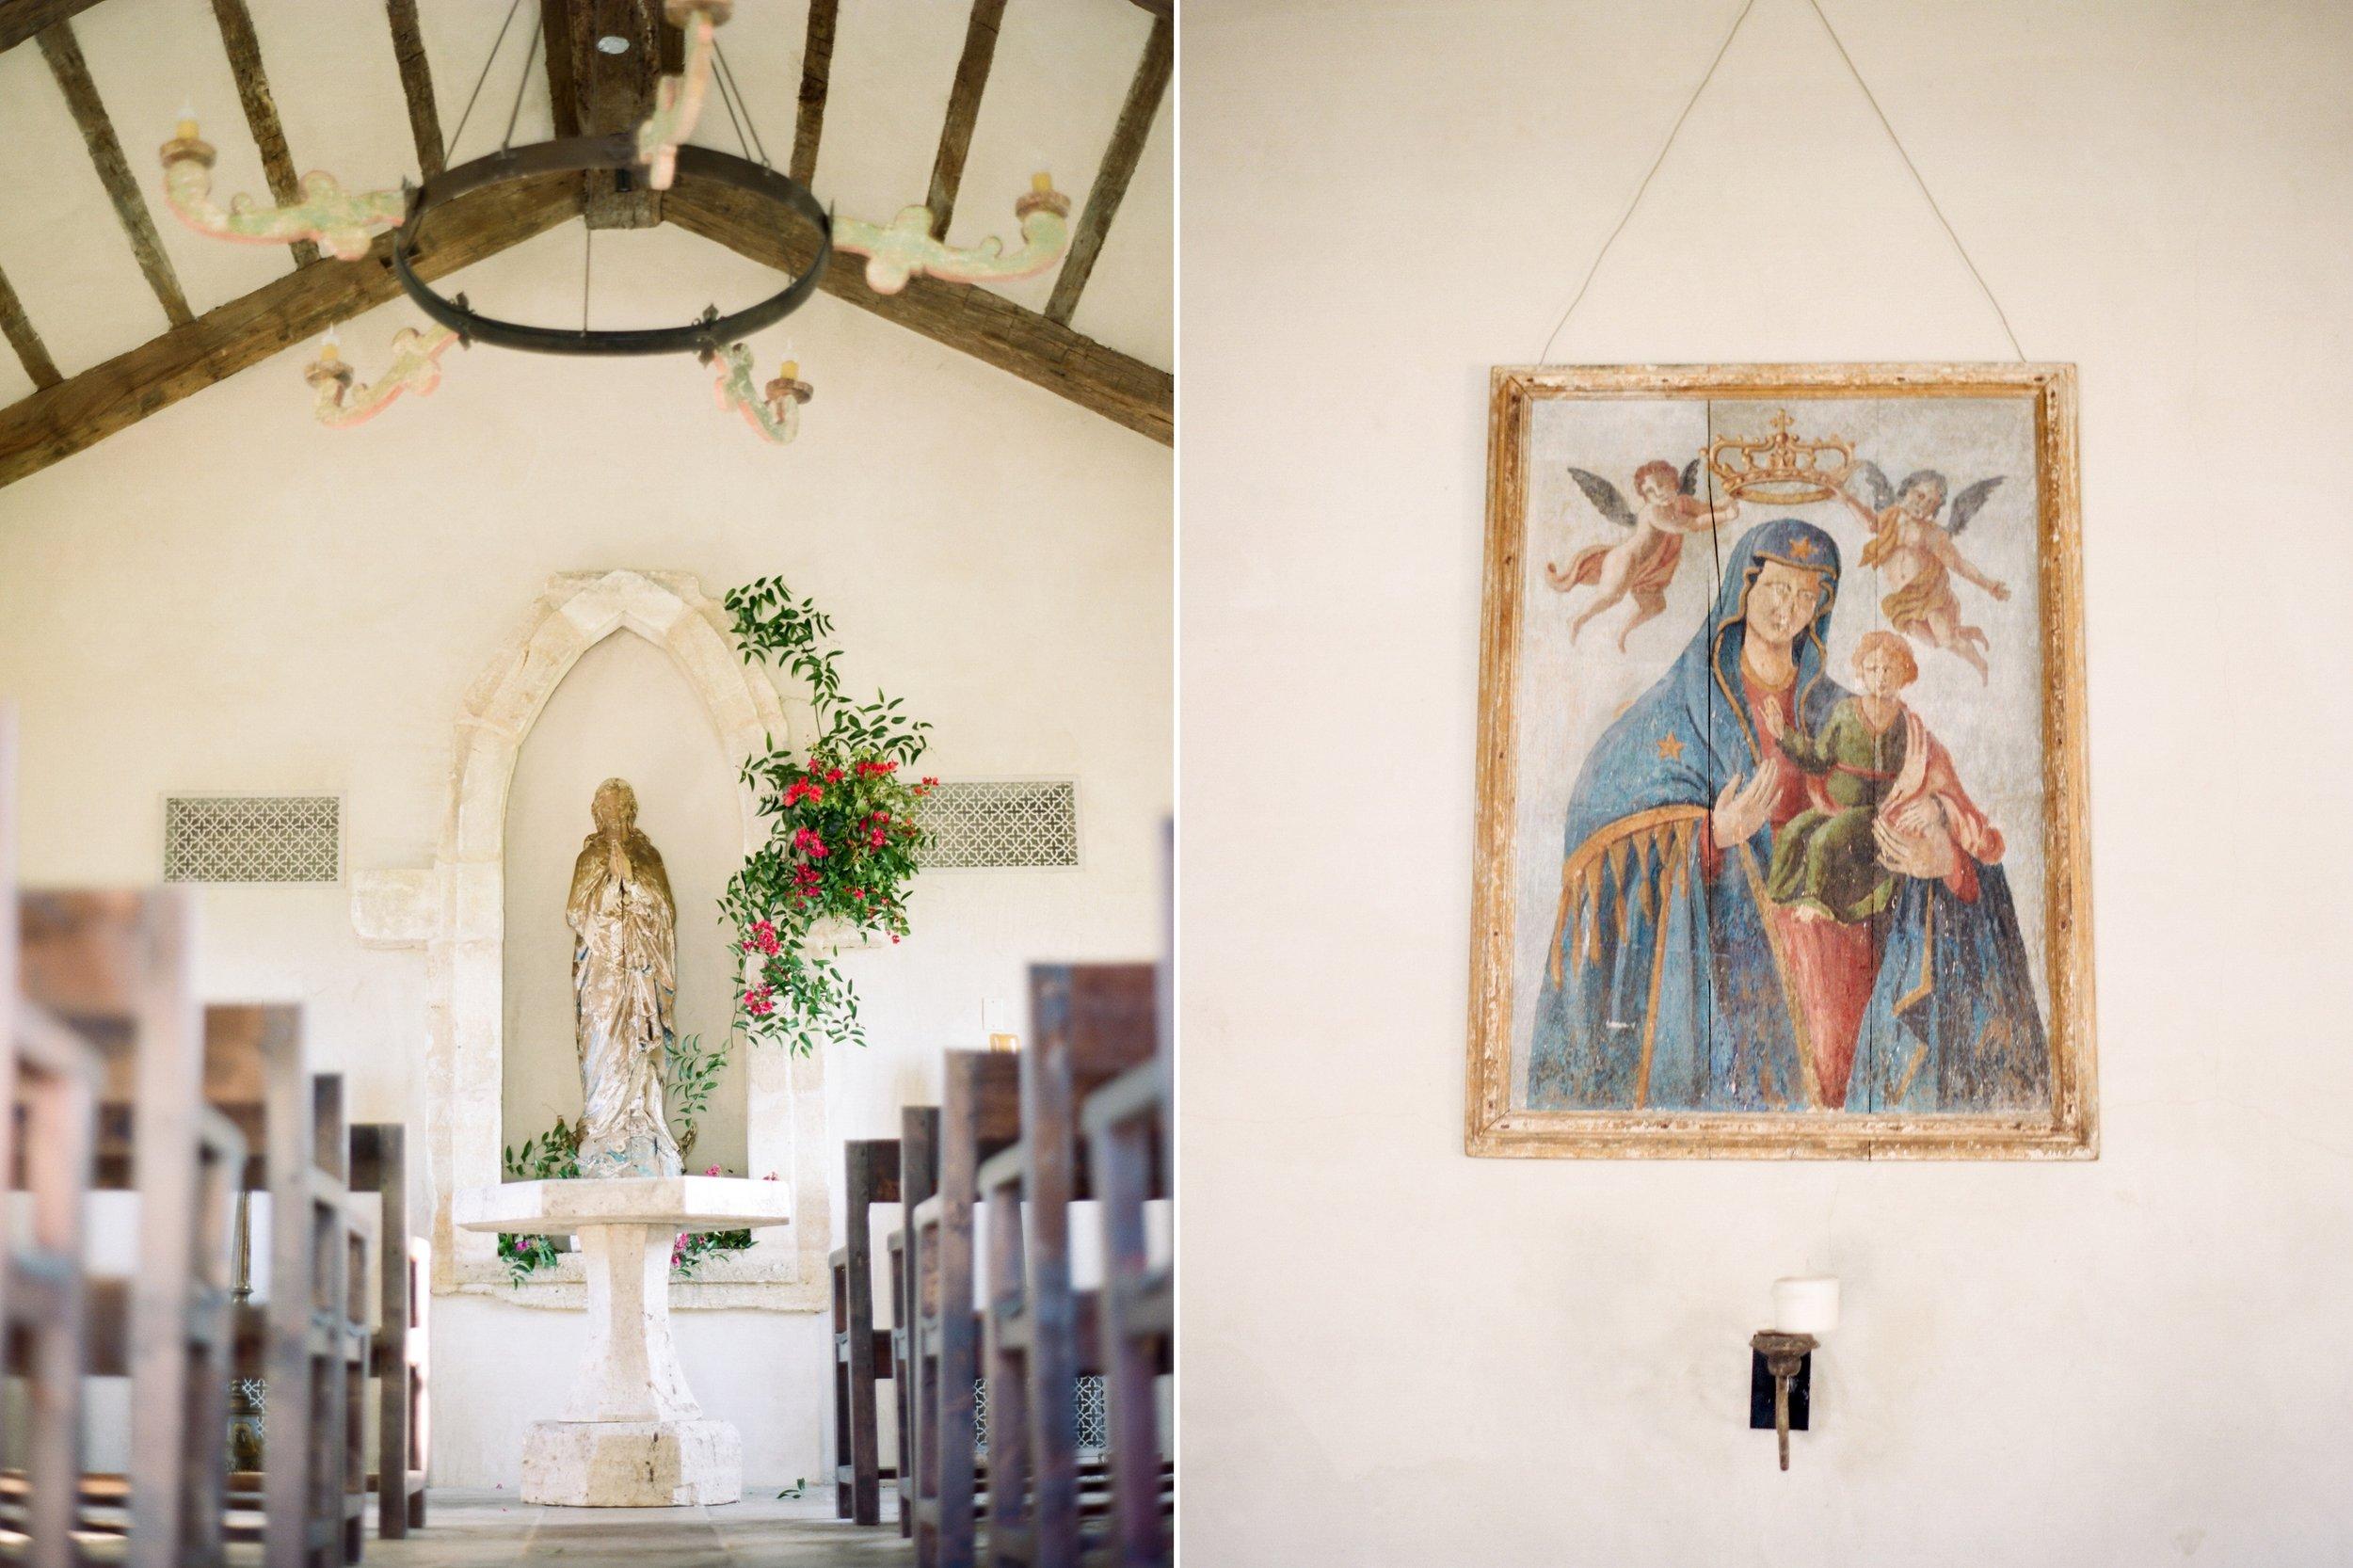 the-clubs-at-houston-oaks-wedding-houston-oaks-wedding-ceremony-houston-oaks-chapel-belle-of-the-ball-dana-fernandez-photography-houston-wedding-photographer-luxury-film-fine-art-108.jpg